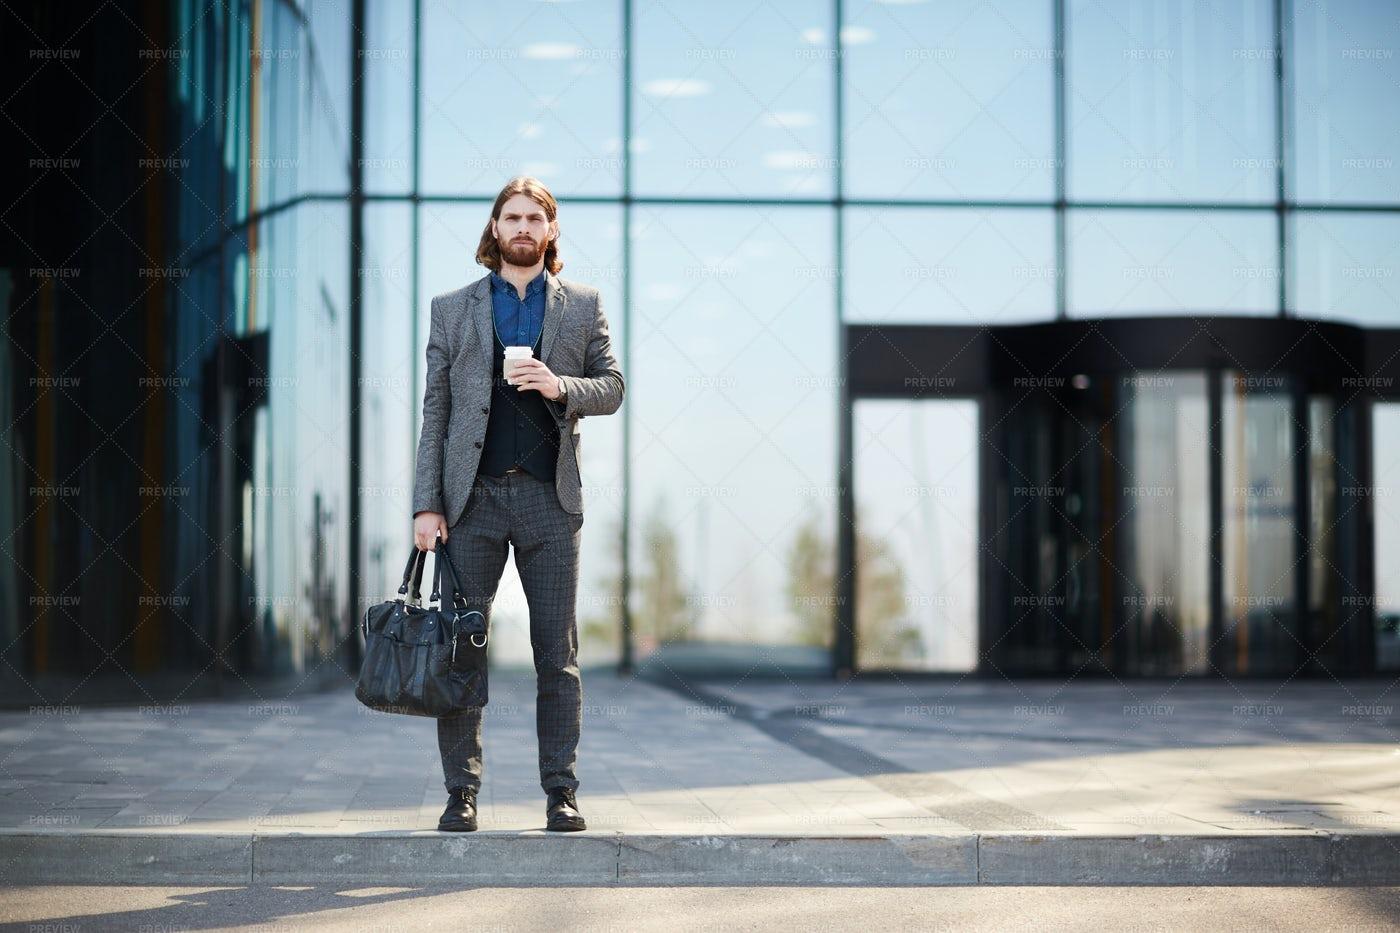 Man On Travel: Stock Photos